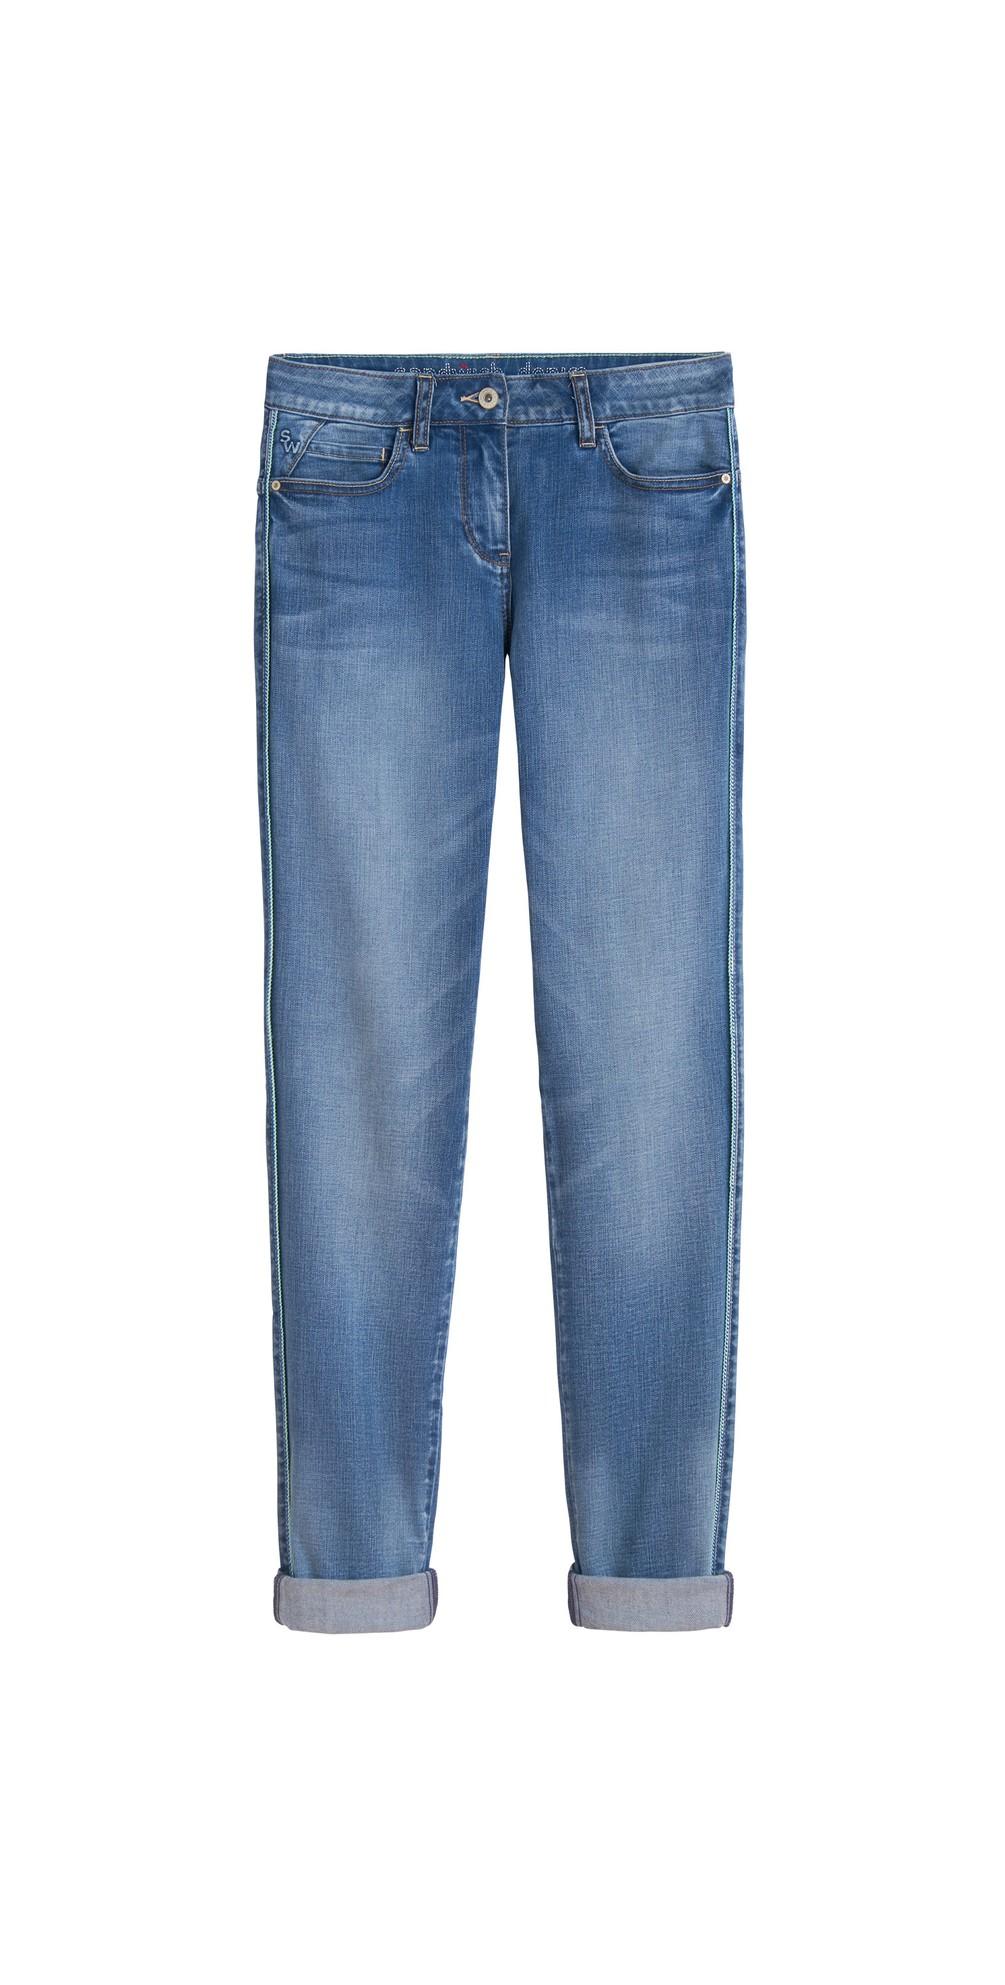 Skinny Denim Jeans main image